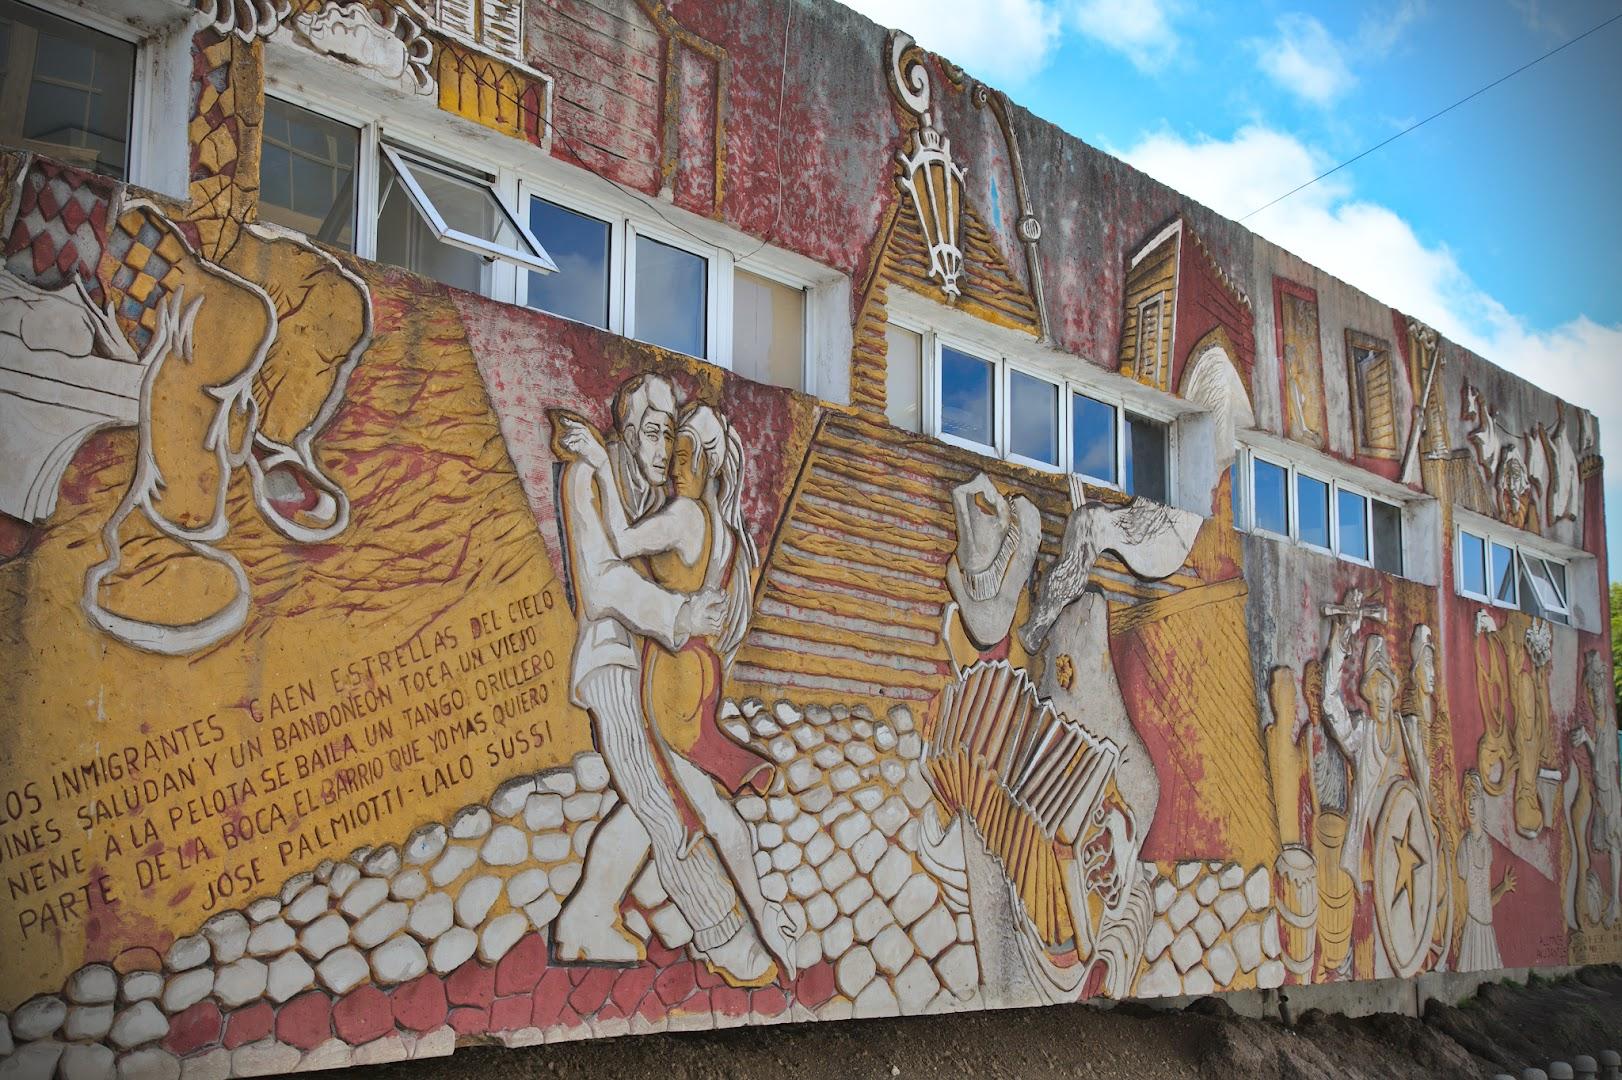 La Boca is home of tango